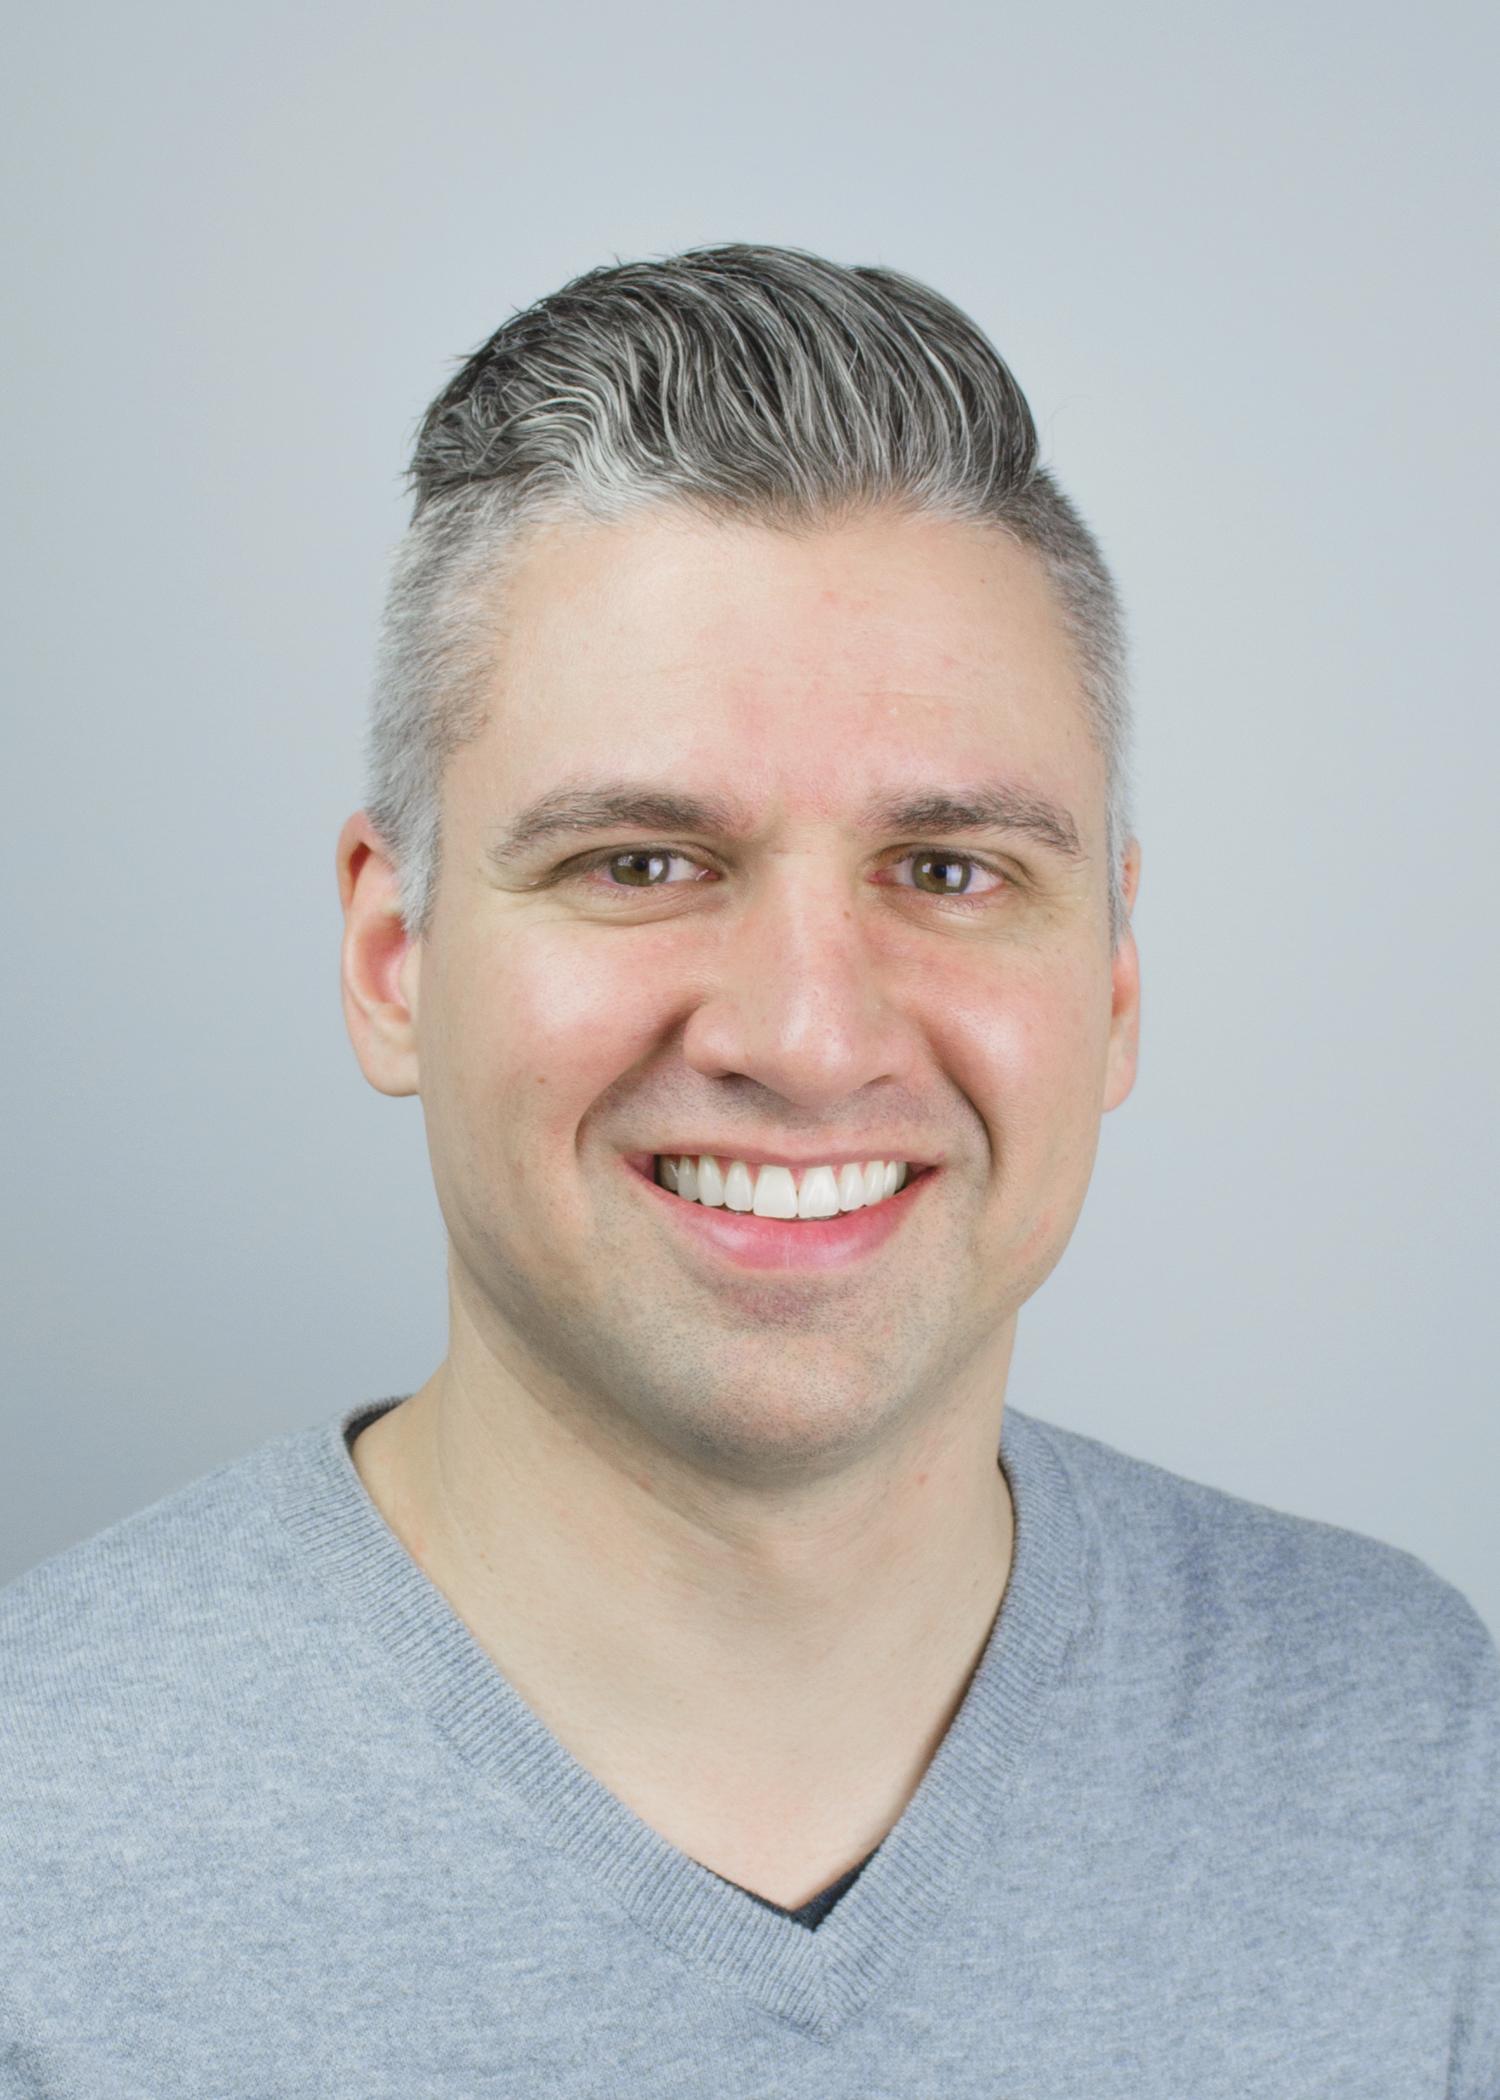 JOSEPH PARK , AIA Design Director